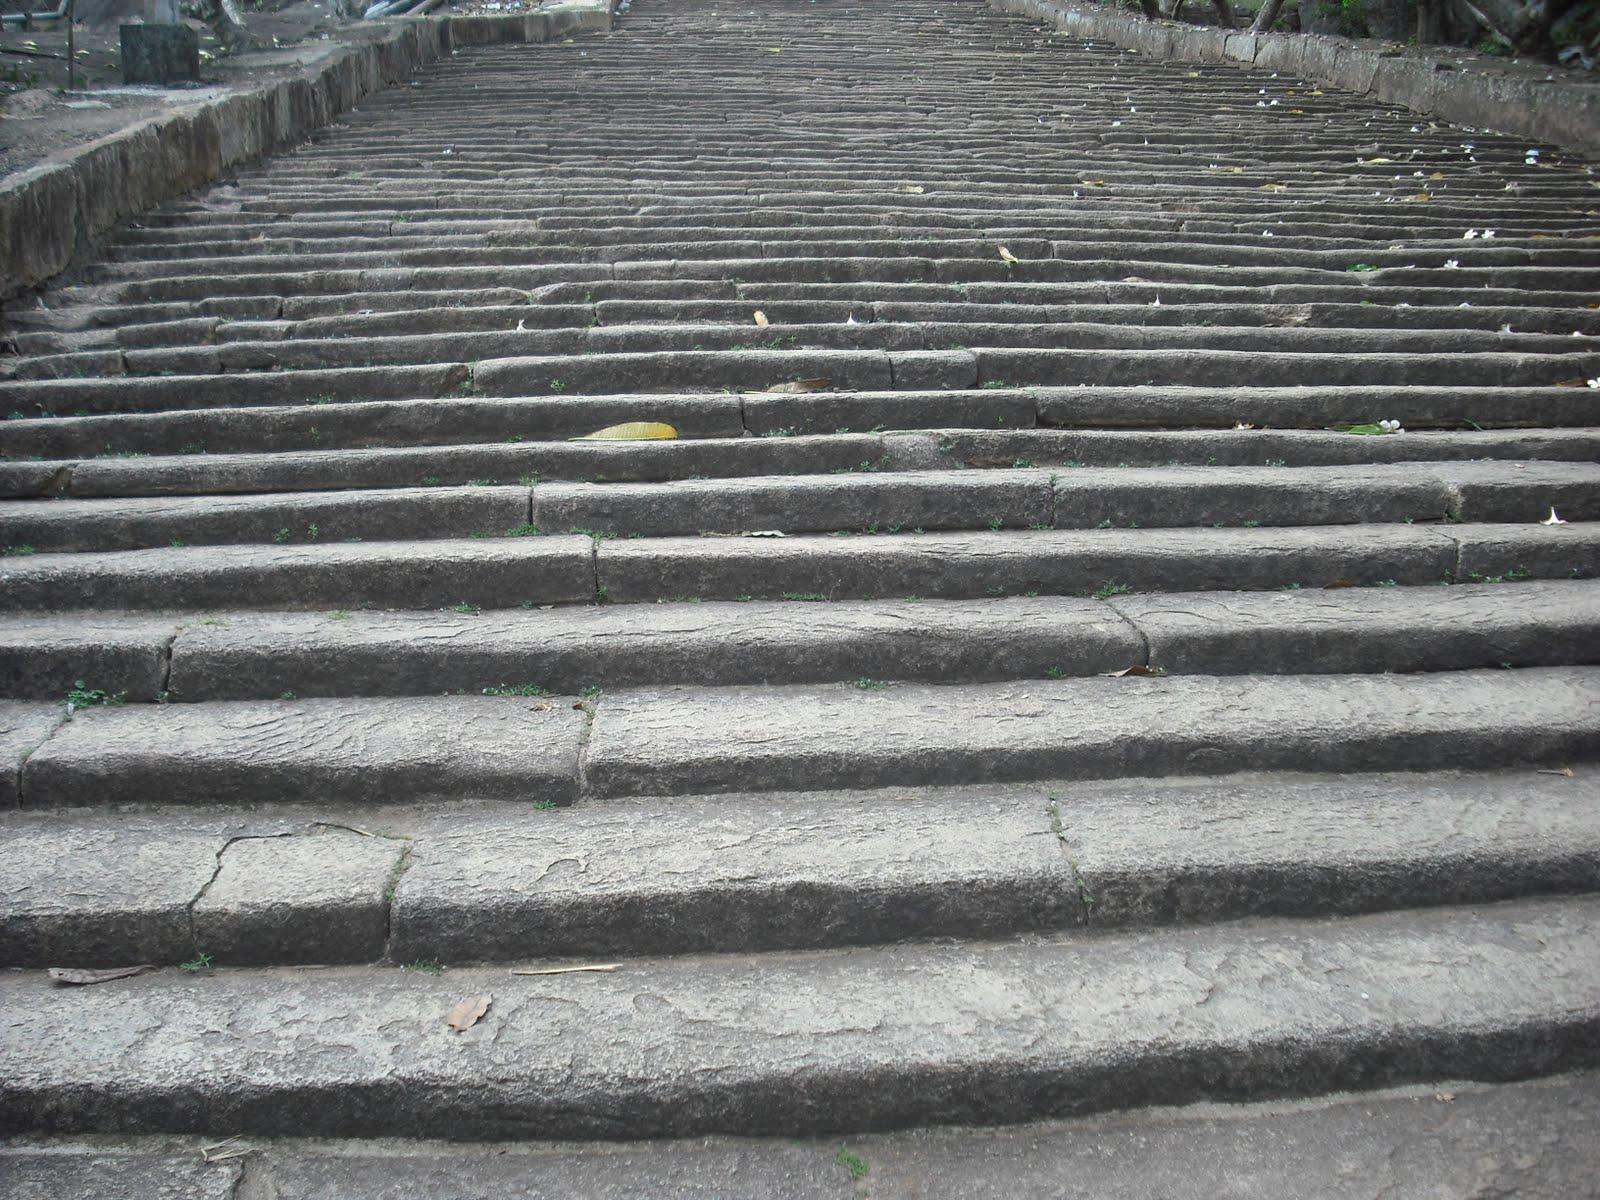 Images of Sri Lanka: Mihinthalaya - Steps Steps